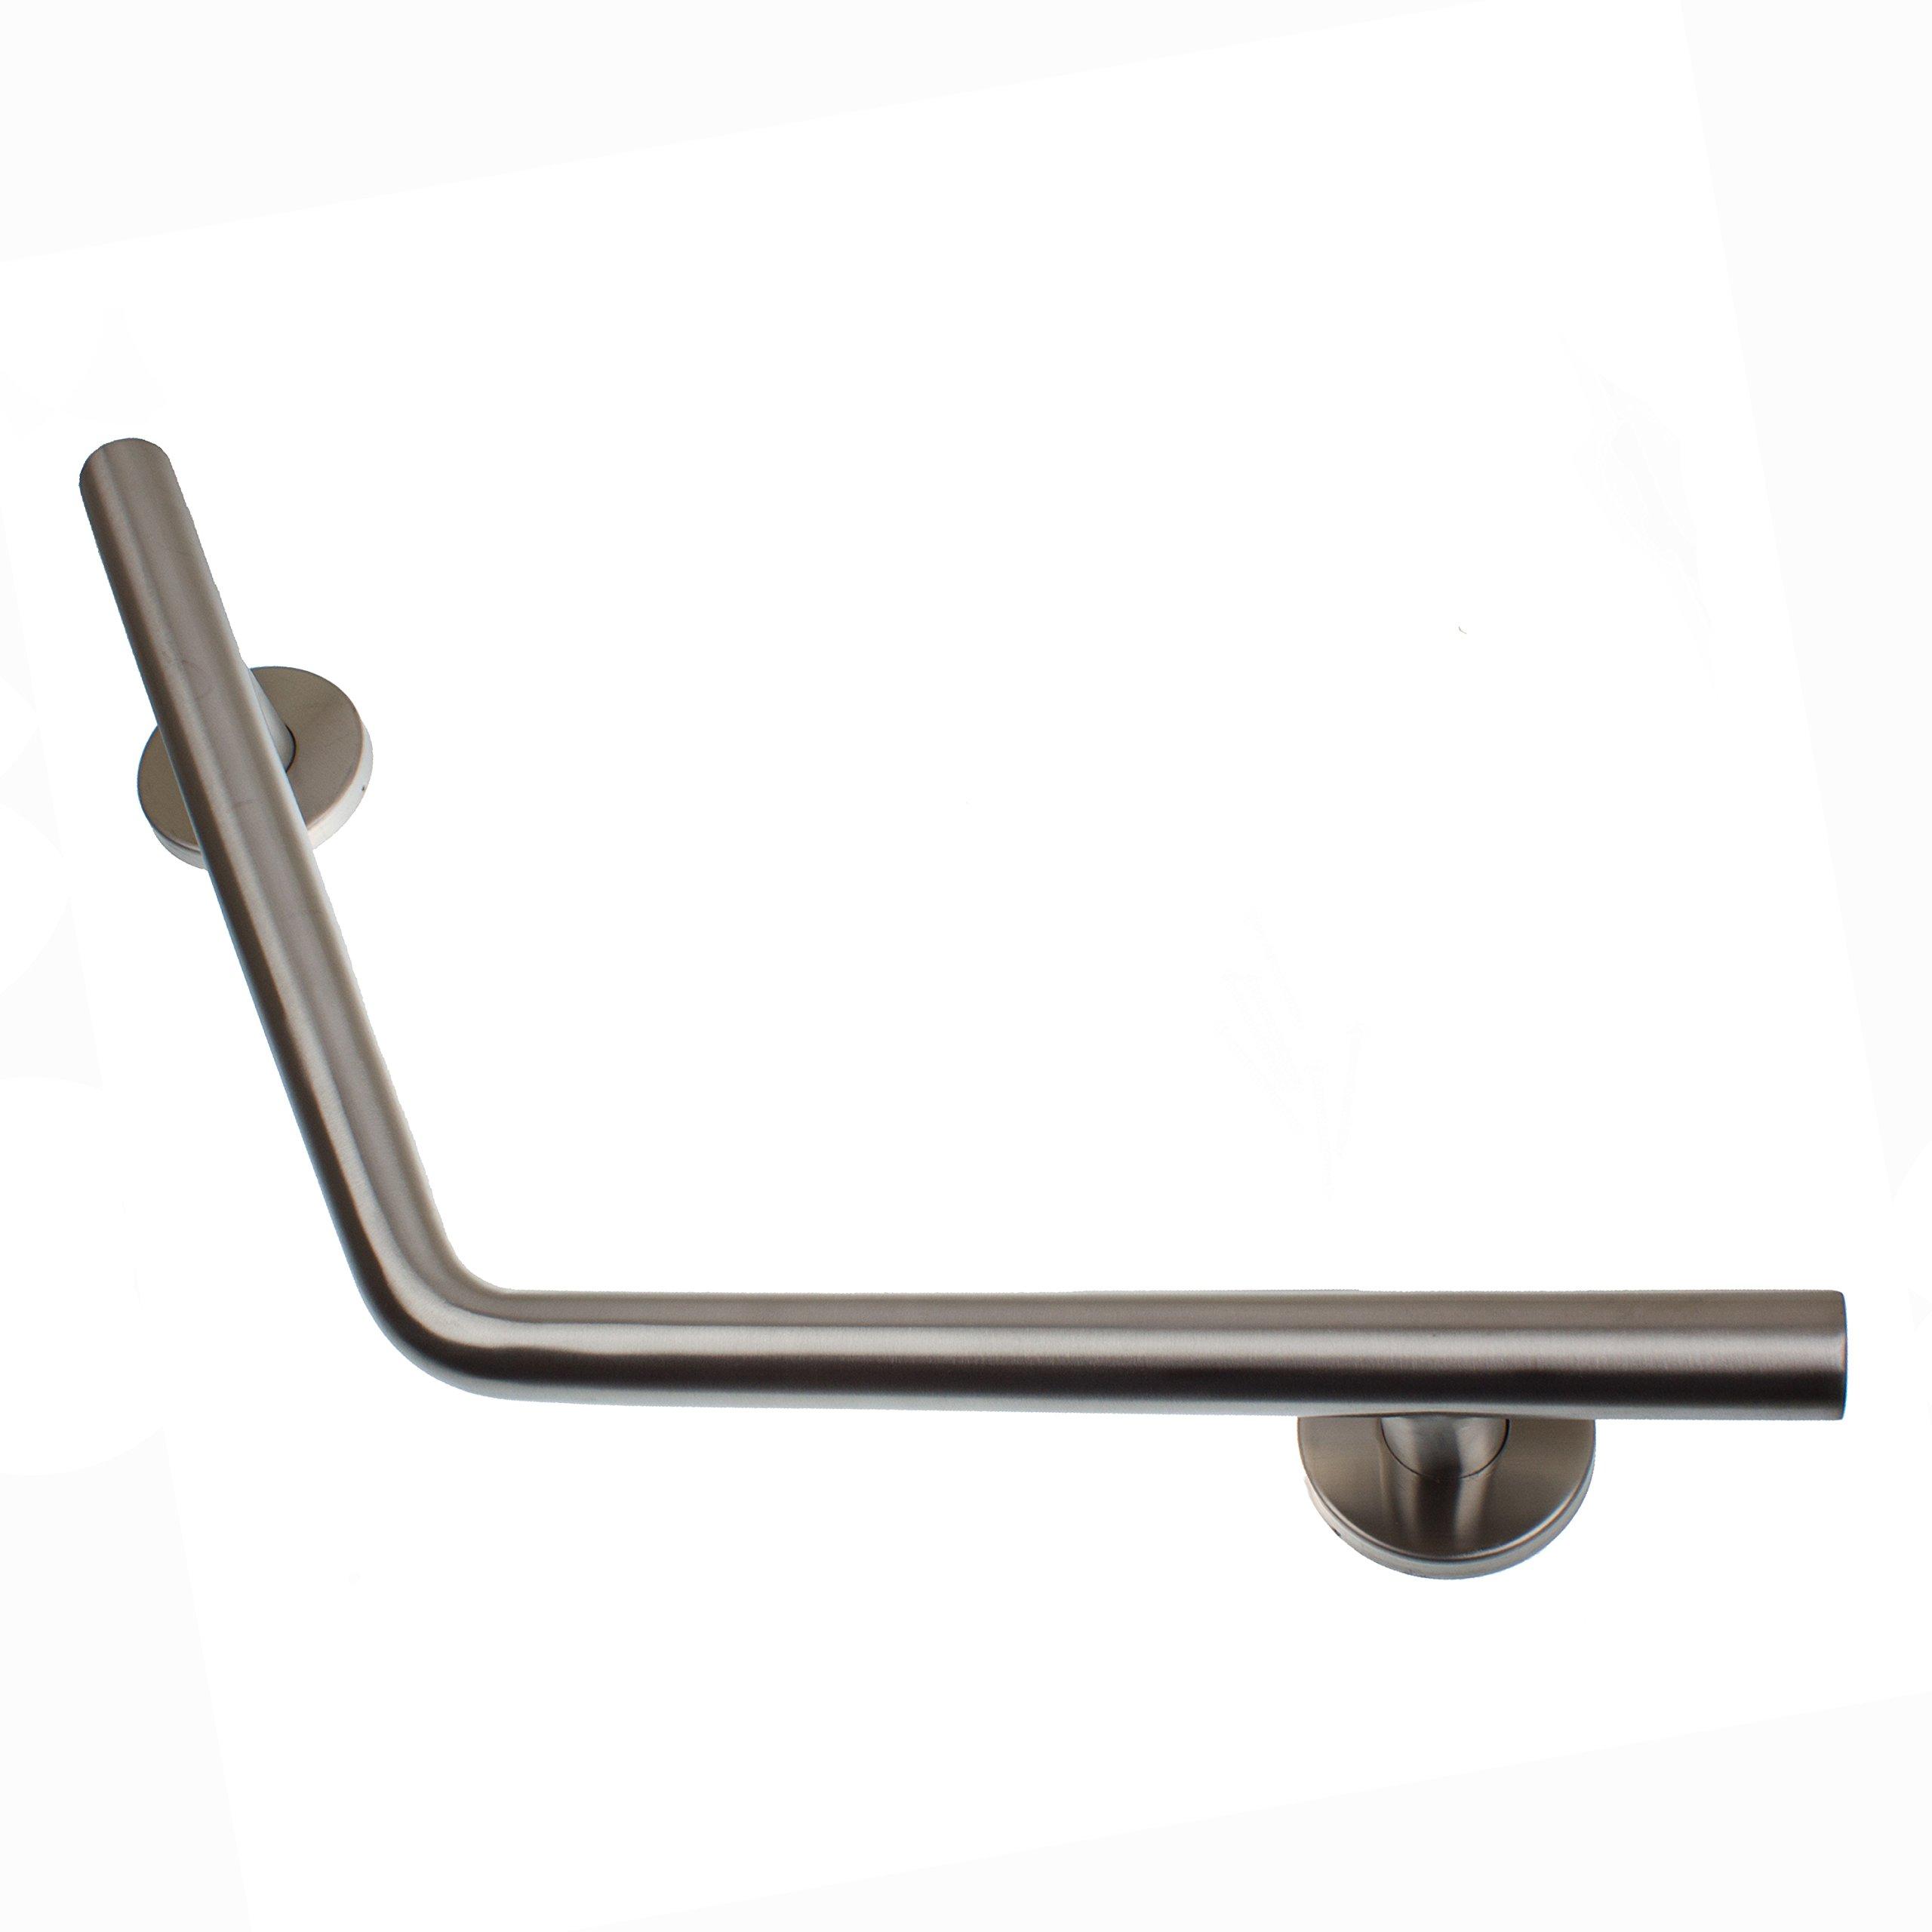 GlideRite Hardware Curved 18-inch Brushed Stainless Steel Safety Designer Grab Bar (Curved Bar)